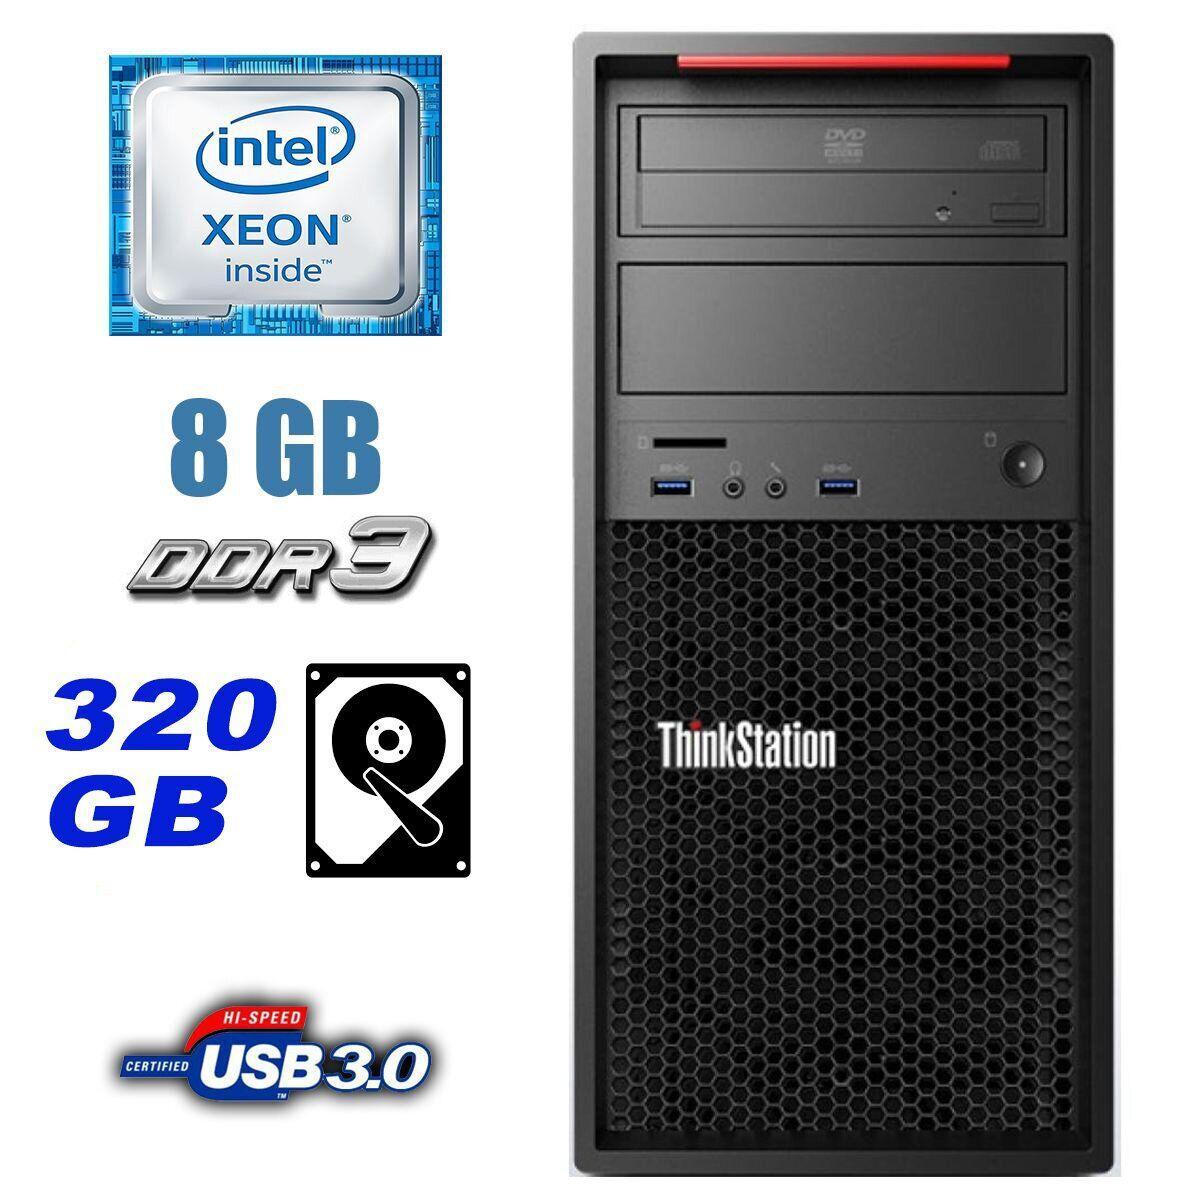 Lenovo ThinkStation P300 / Intel Xeon E3-1220 v3 (4 ядра по 3.1-3.5GHz) / 8 GB DDR3 / 320 GB HDD / nVidia